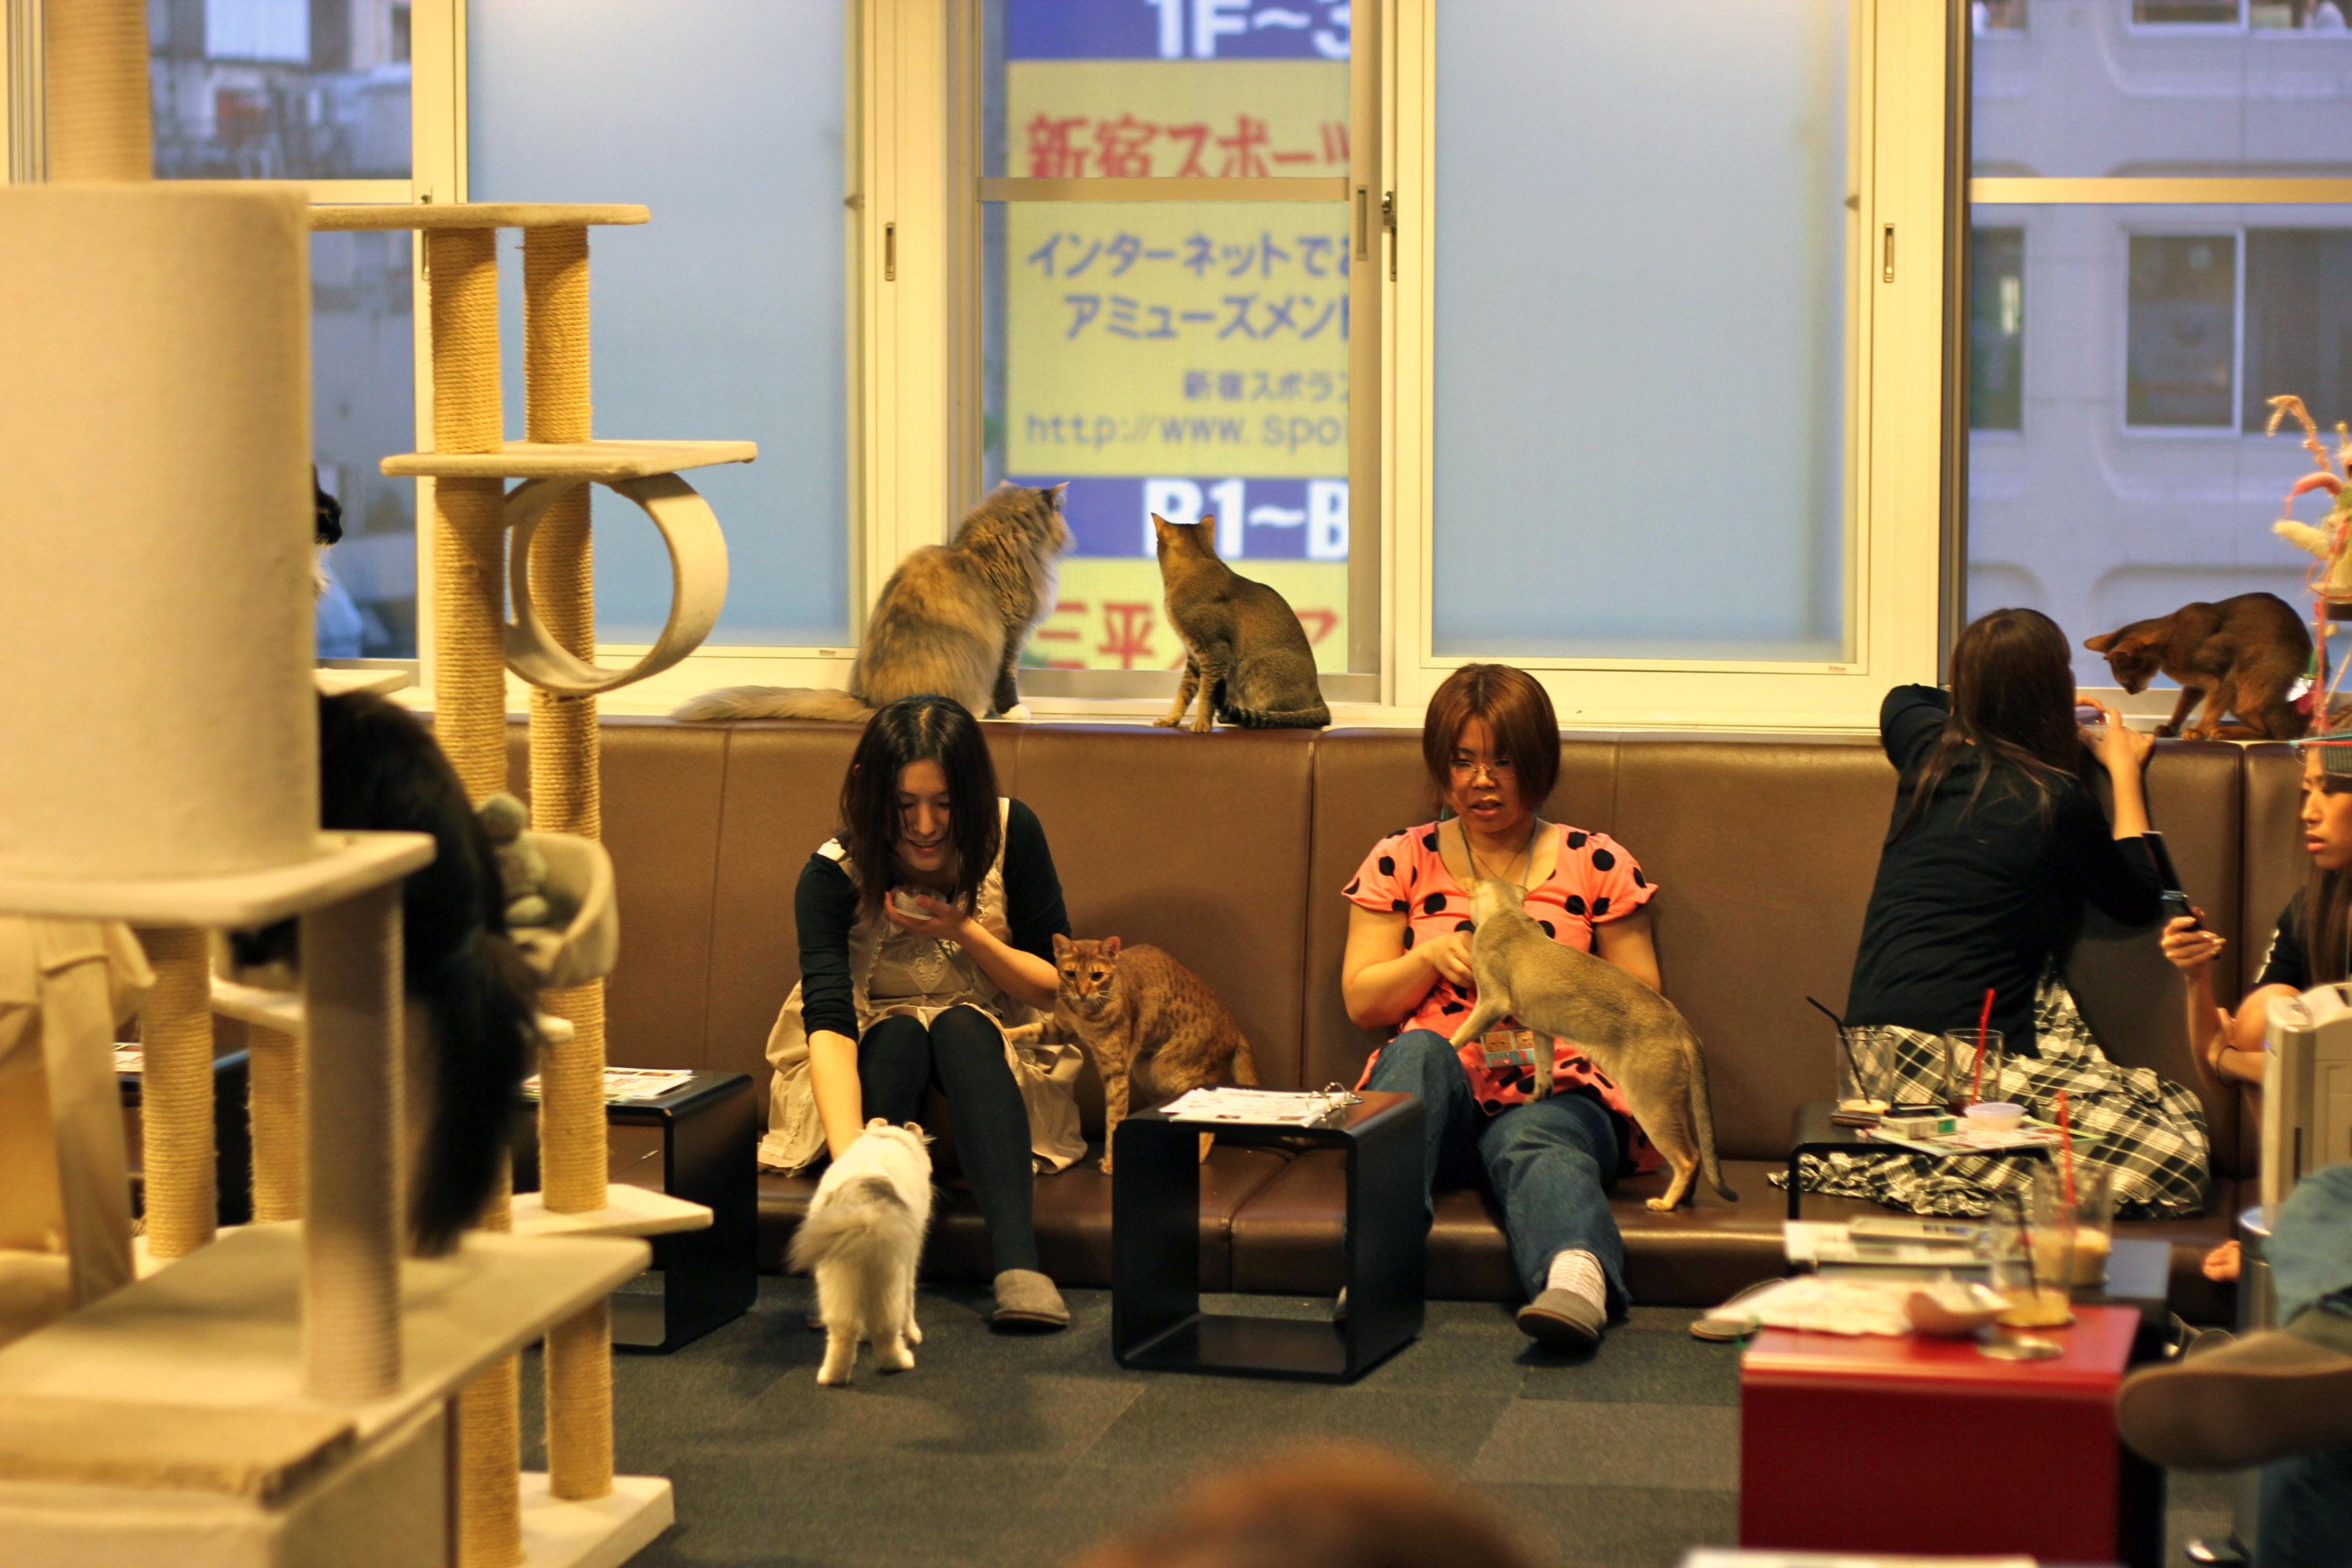 Uniknya Tren Kafe Kucing Di Negeri Sakura